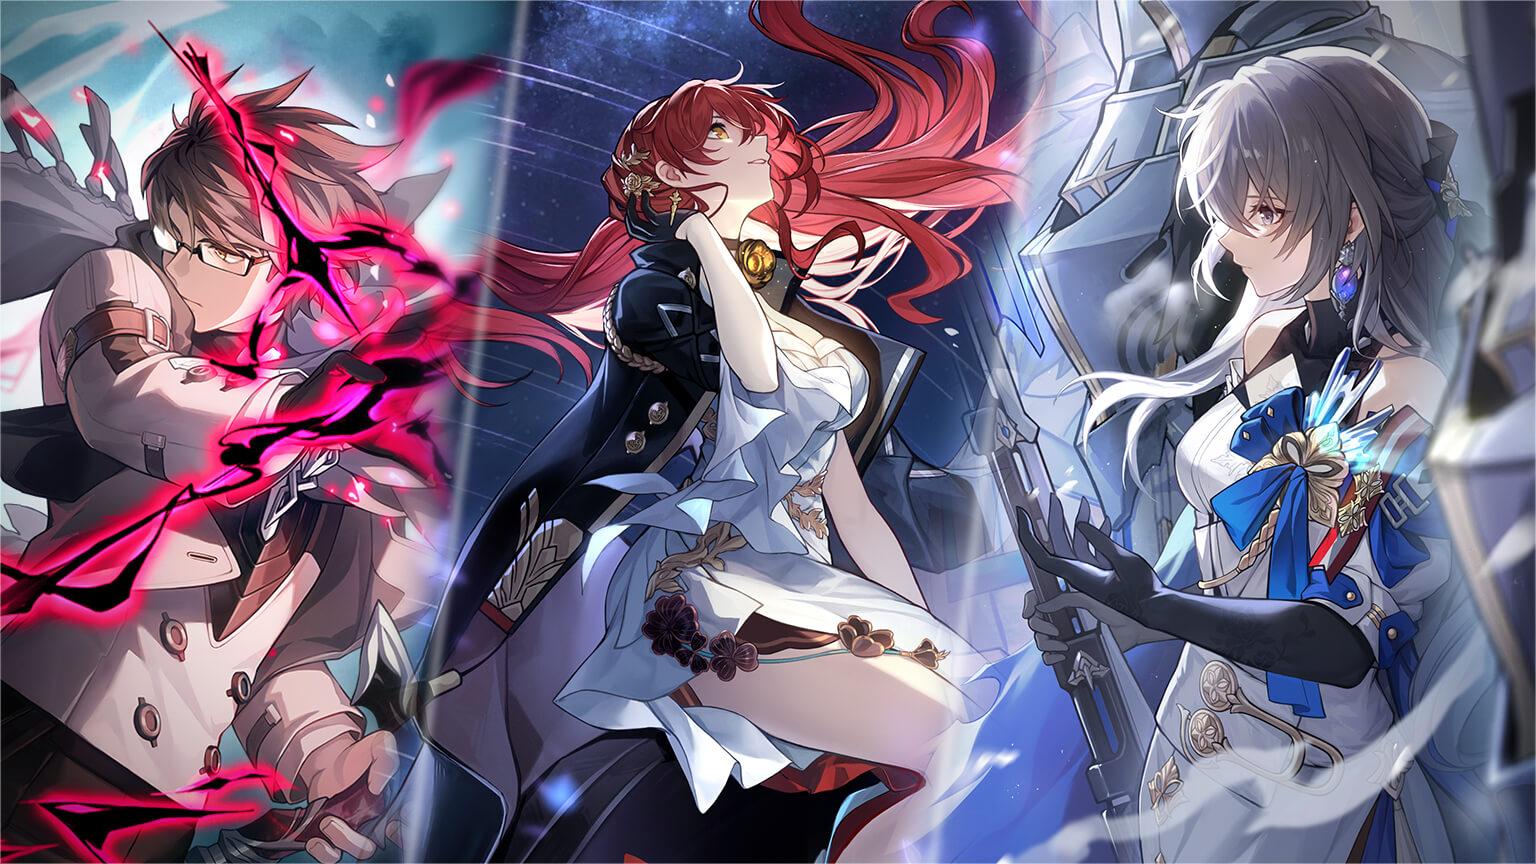 Honkai: Star Rail — новая игра от авторов Genshin Impact